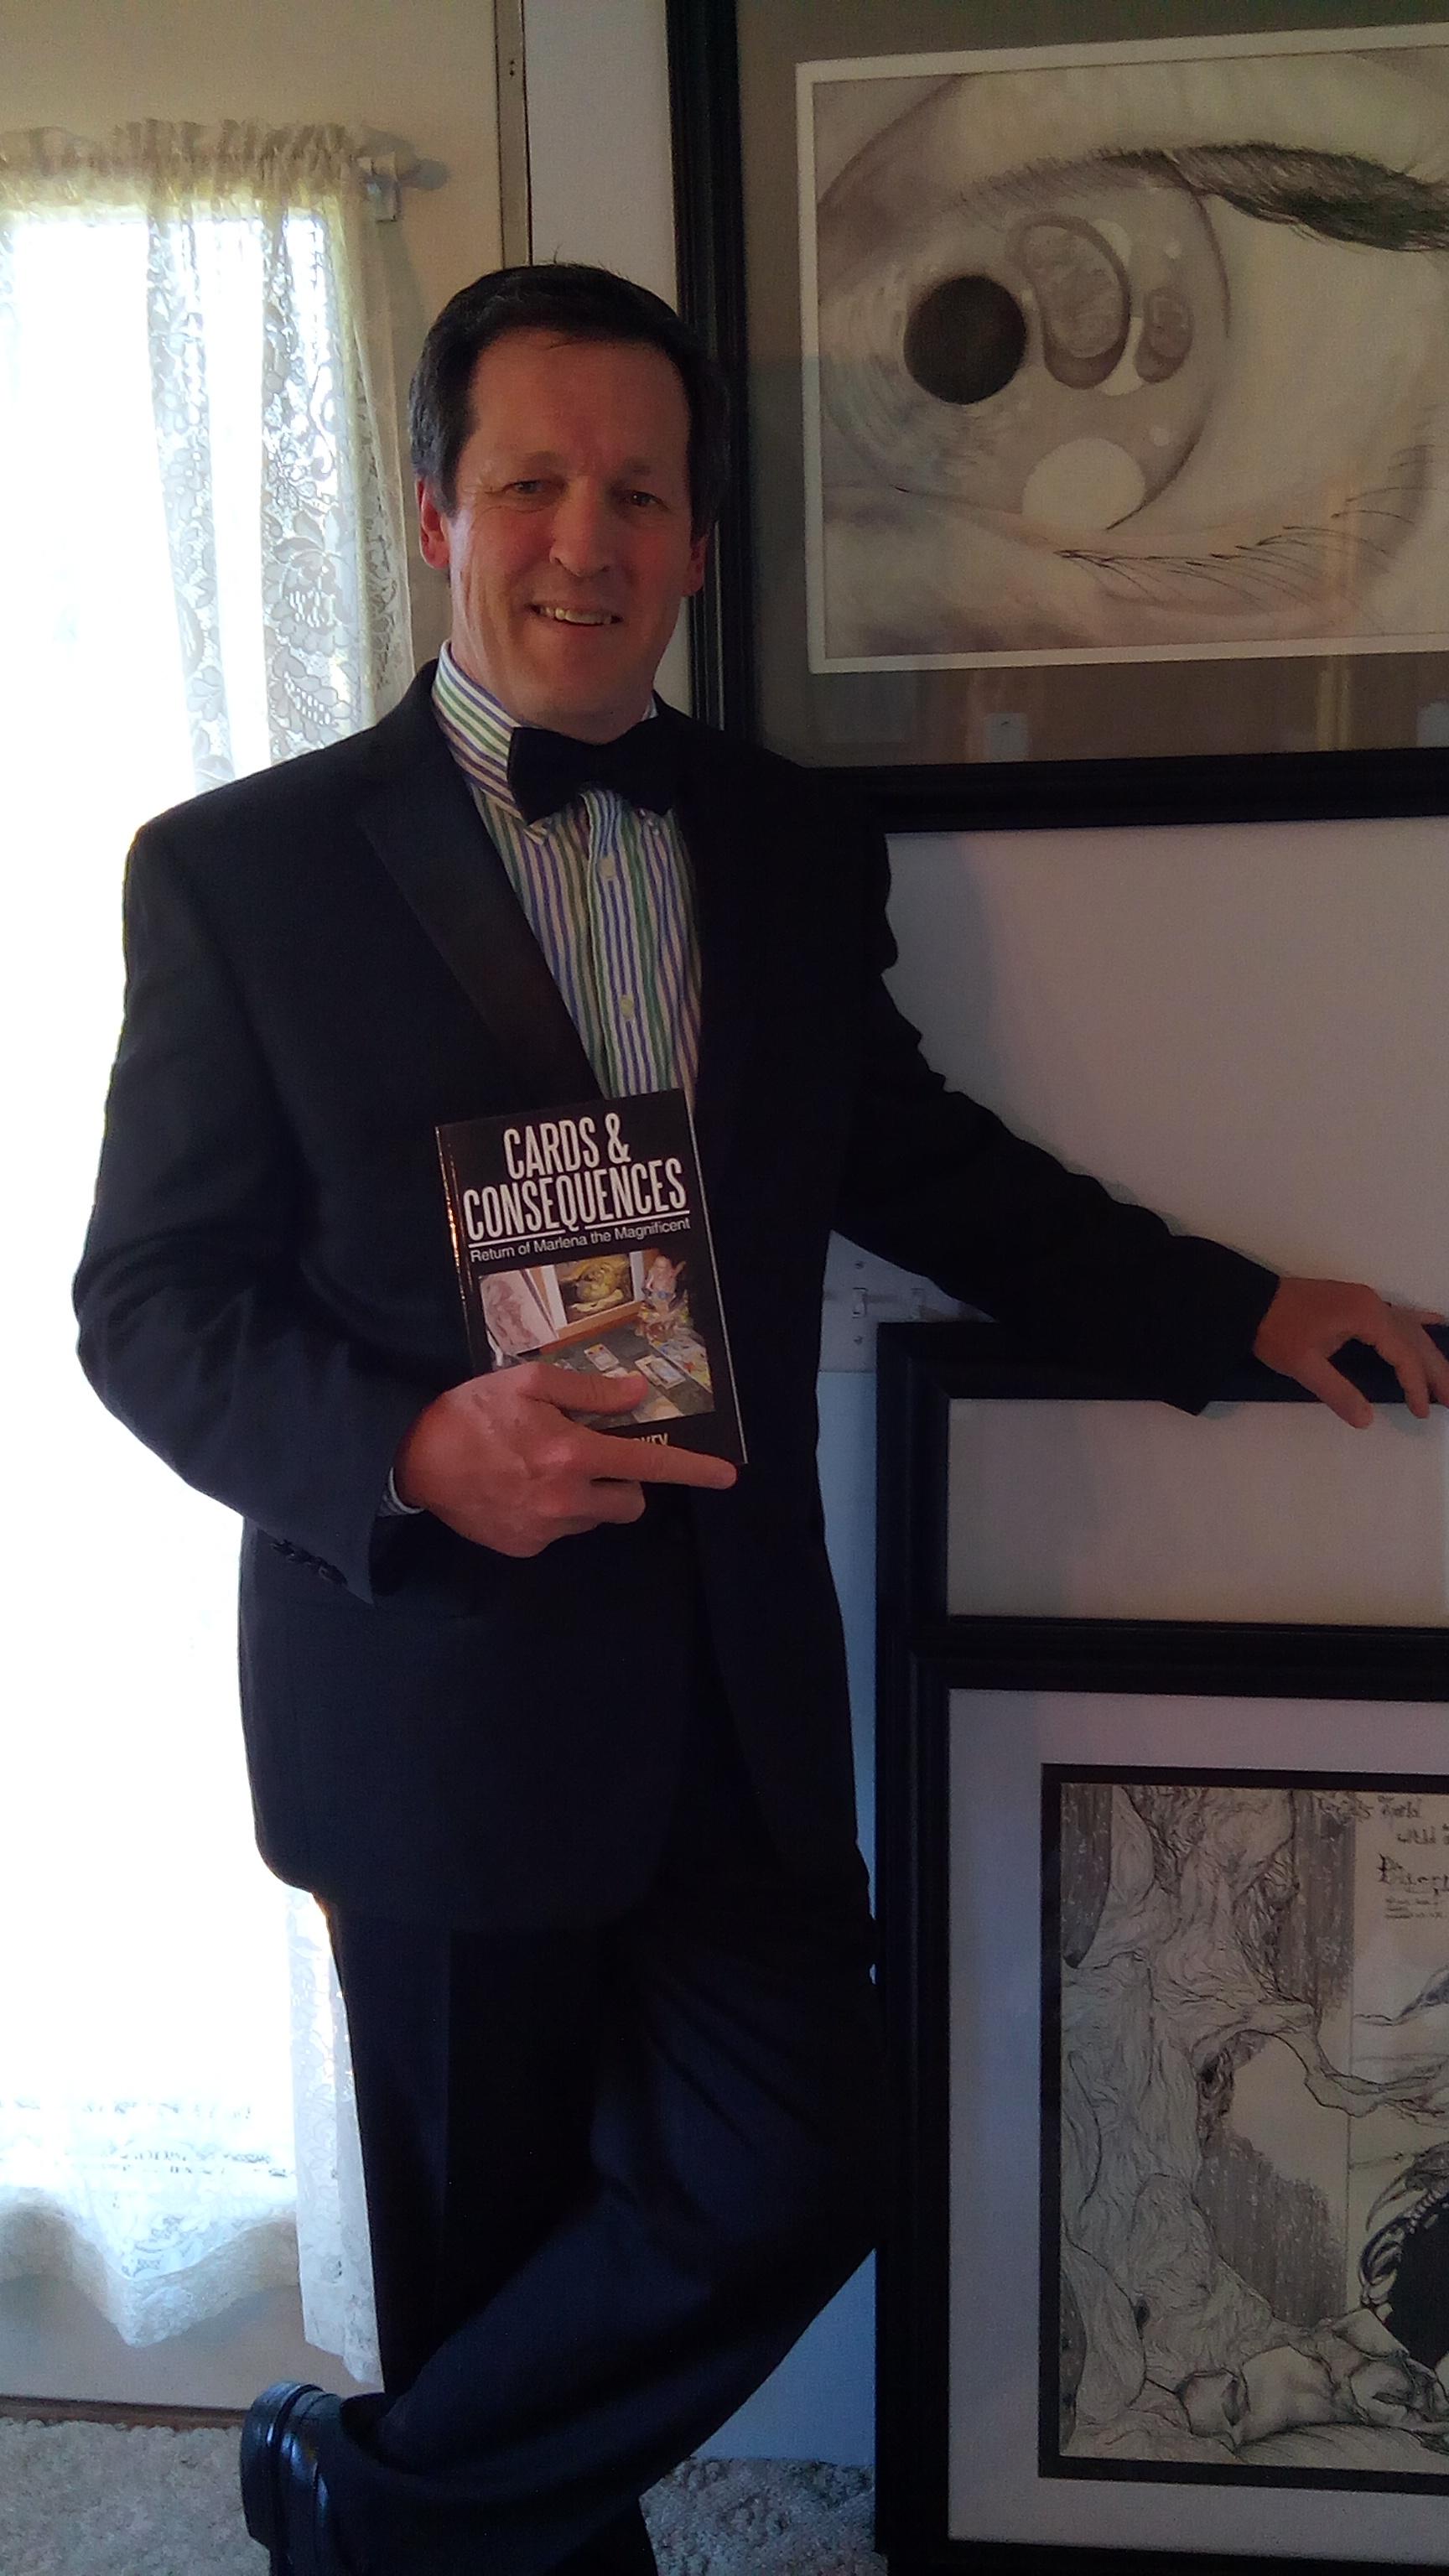 author-sharp dressed man